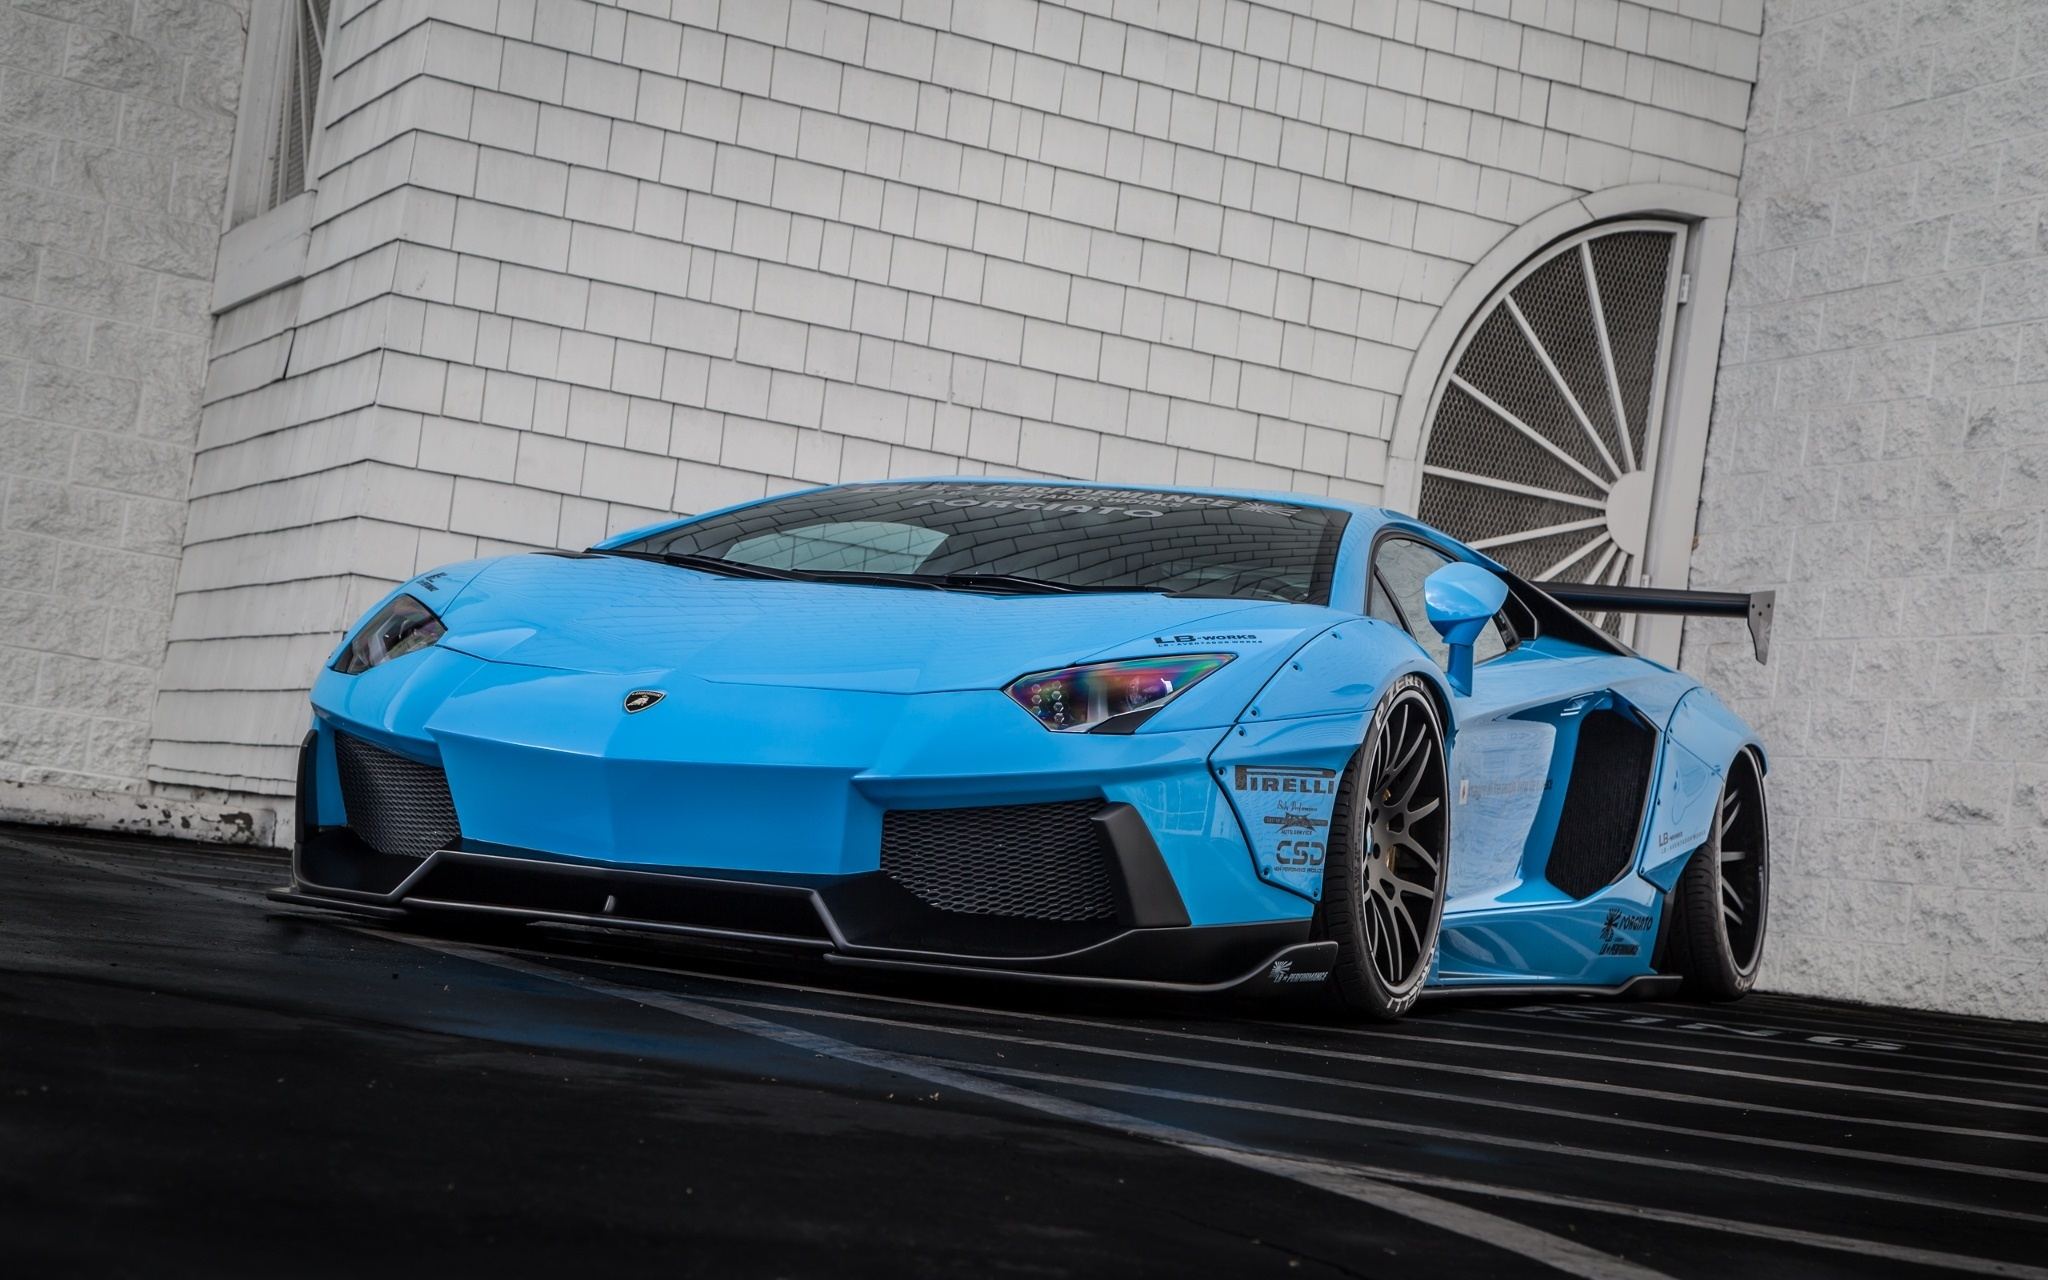 59142 Заставки и Обои Ламборджини (Lamborghini) на телефон. Скачать Ламборджини (Lamborghini), Тачки (Cars), Aventador, Lp700-4, Front View картинки бесплатно